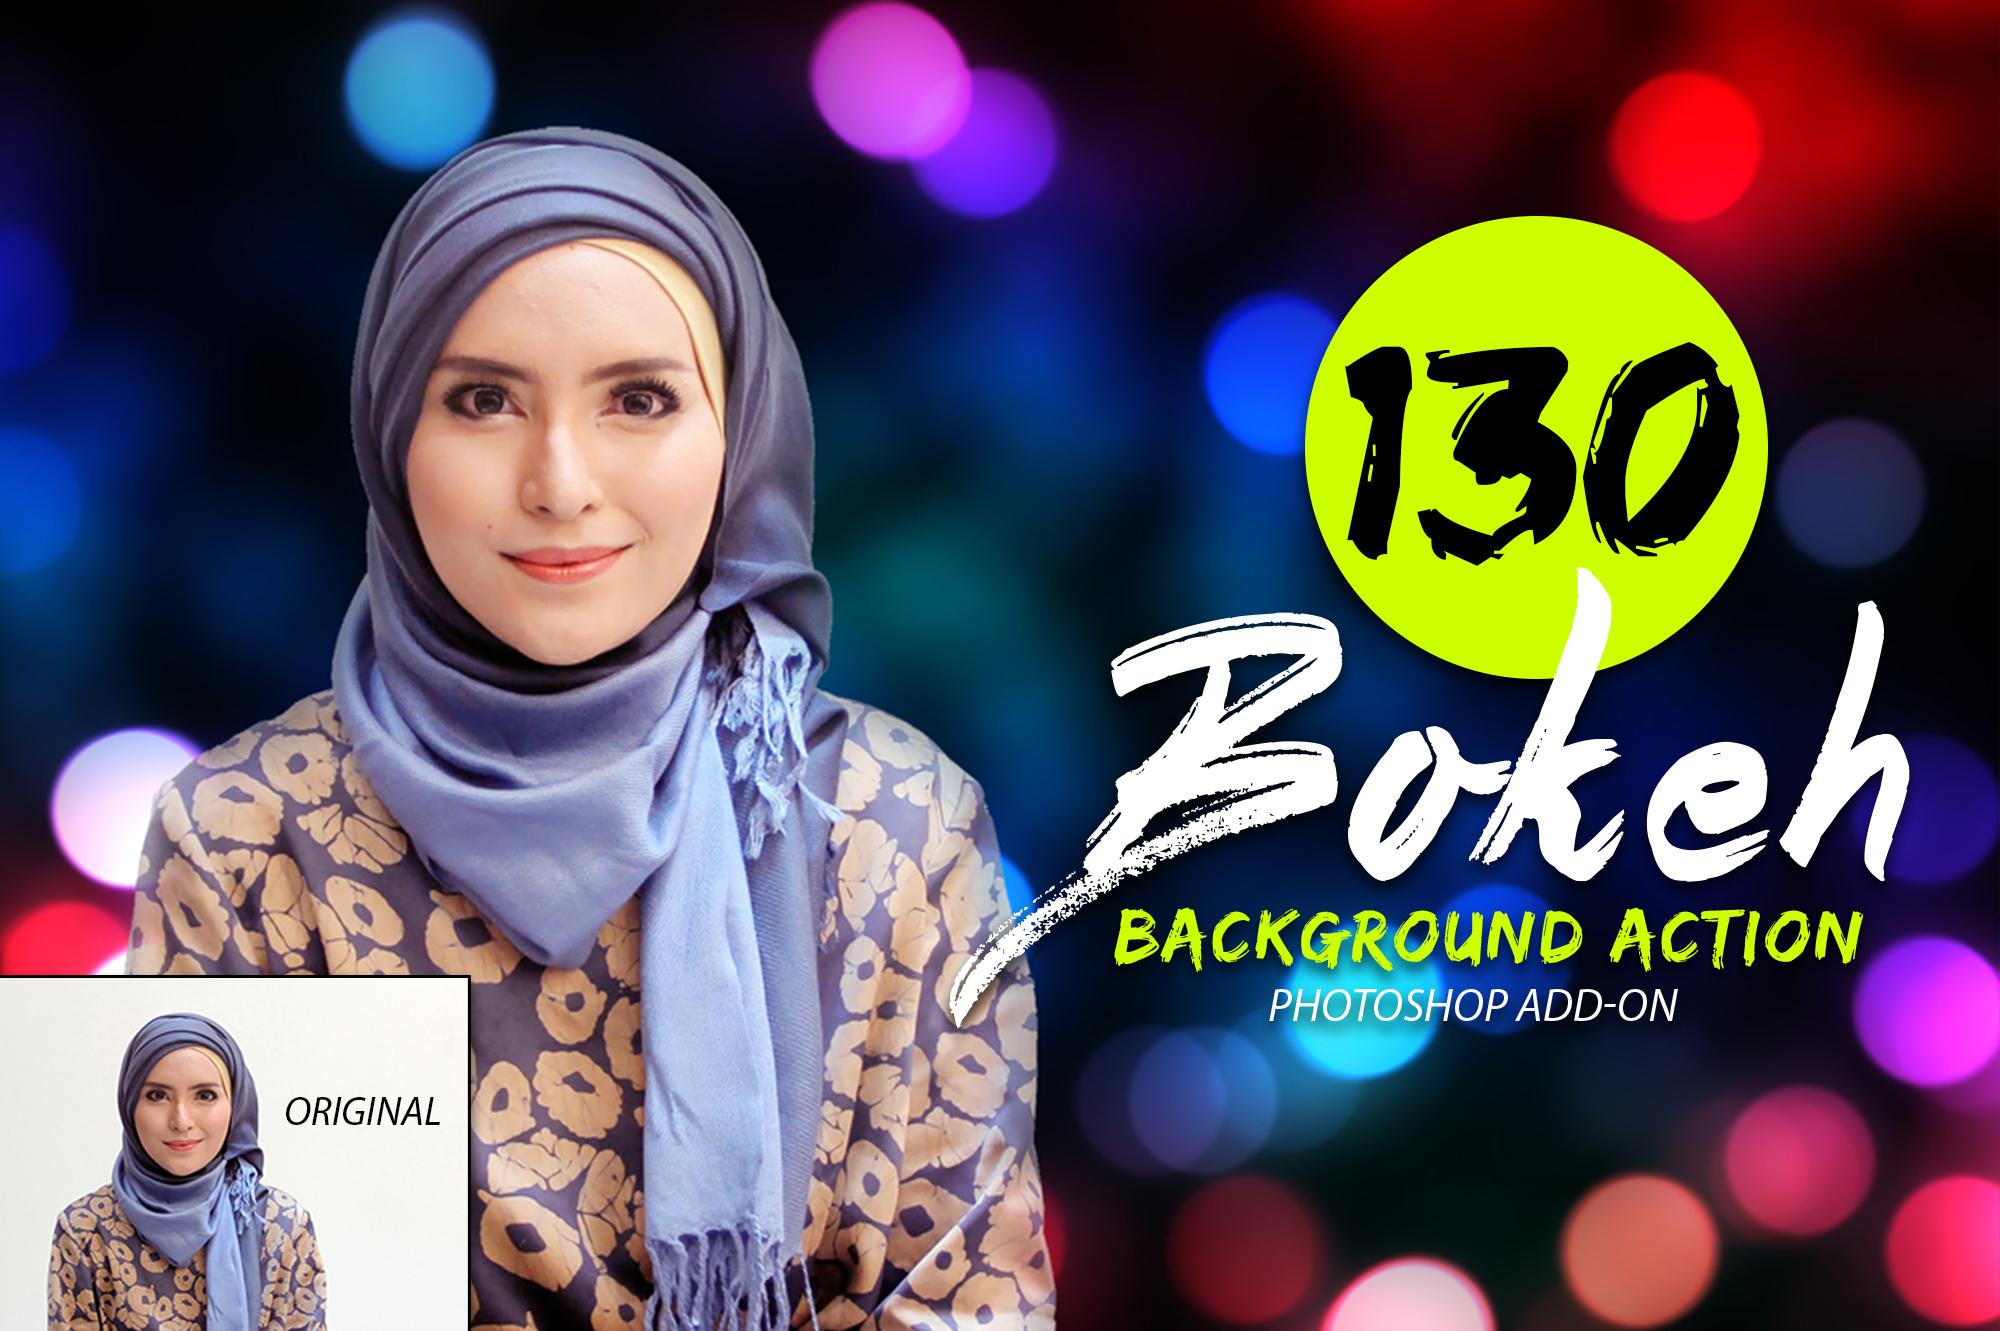 130 Bokeh Photoshop Action example image 3